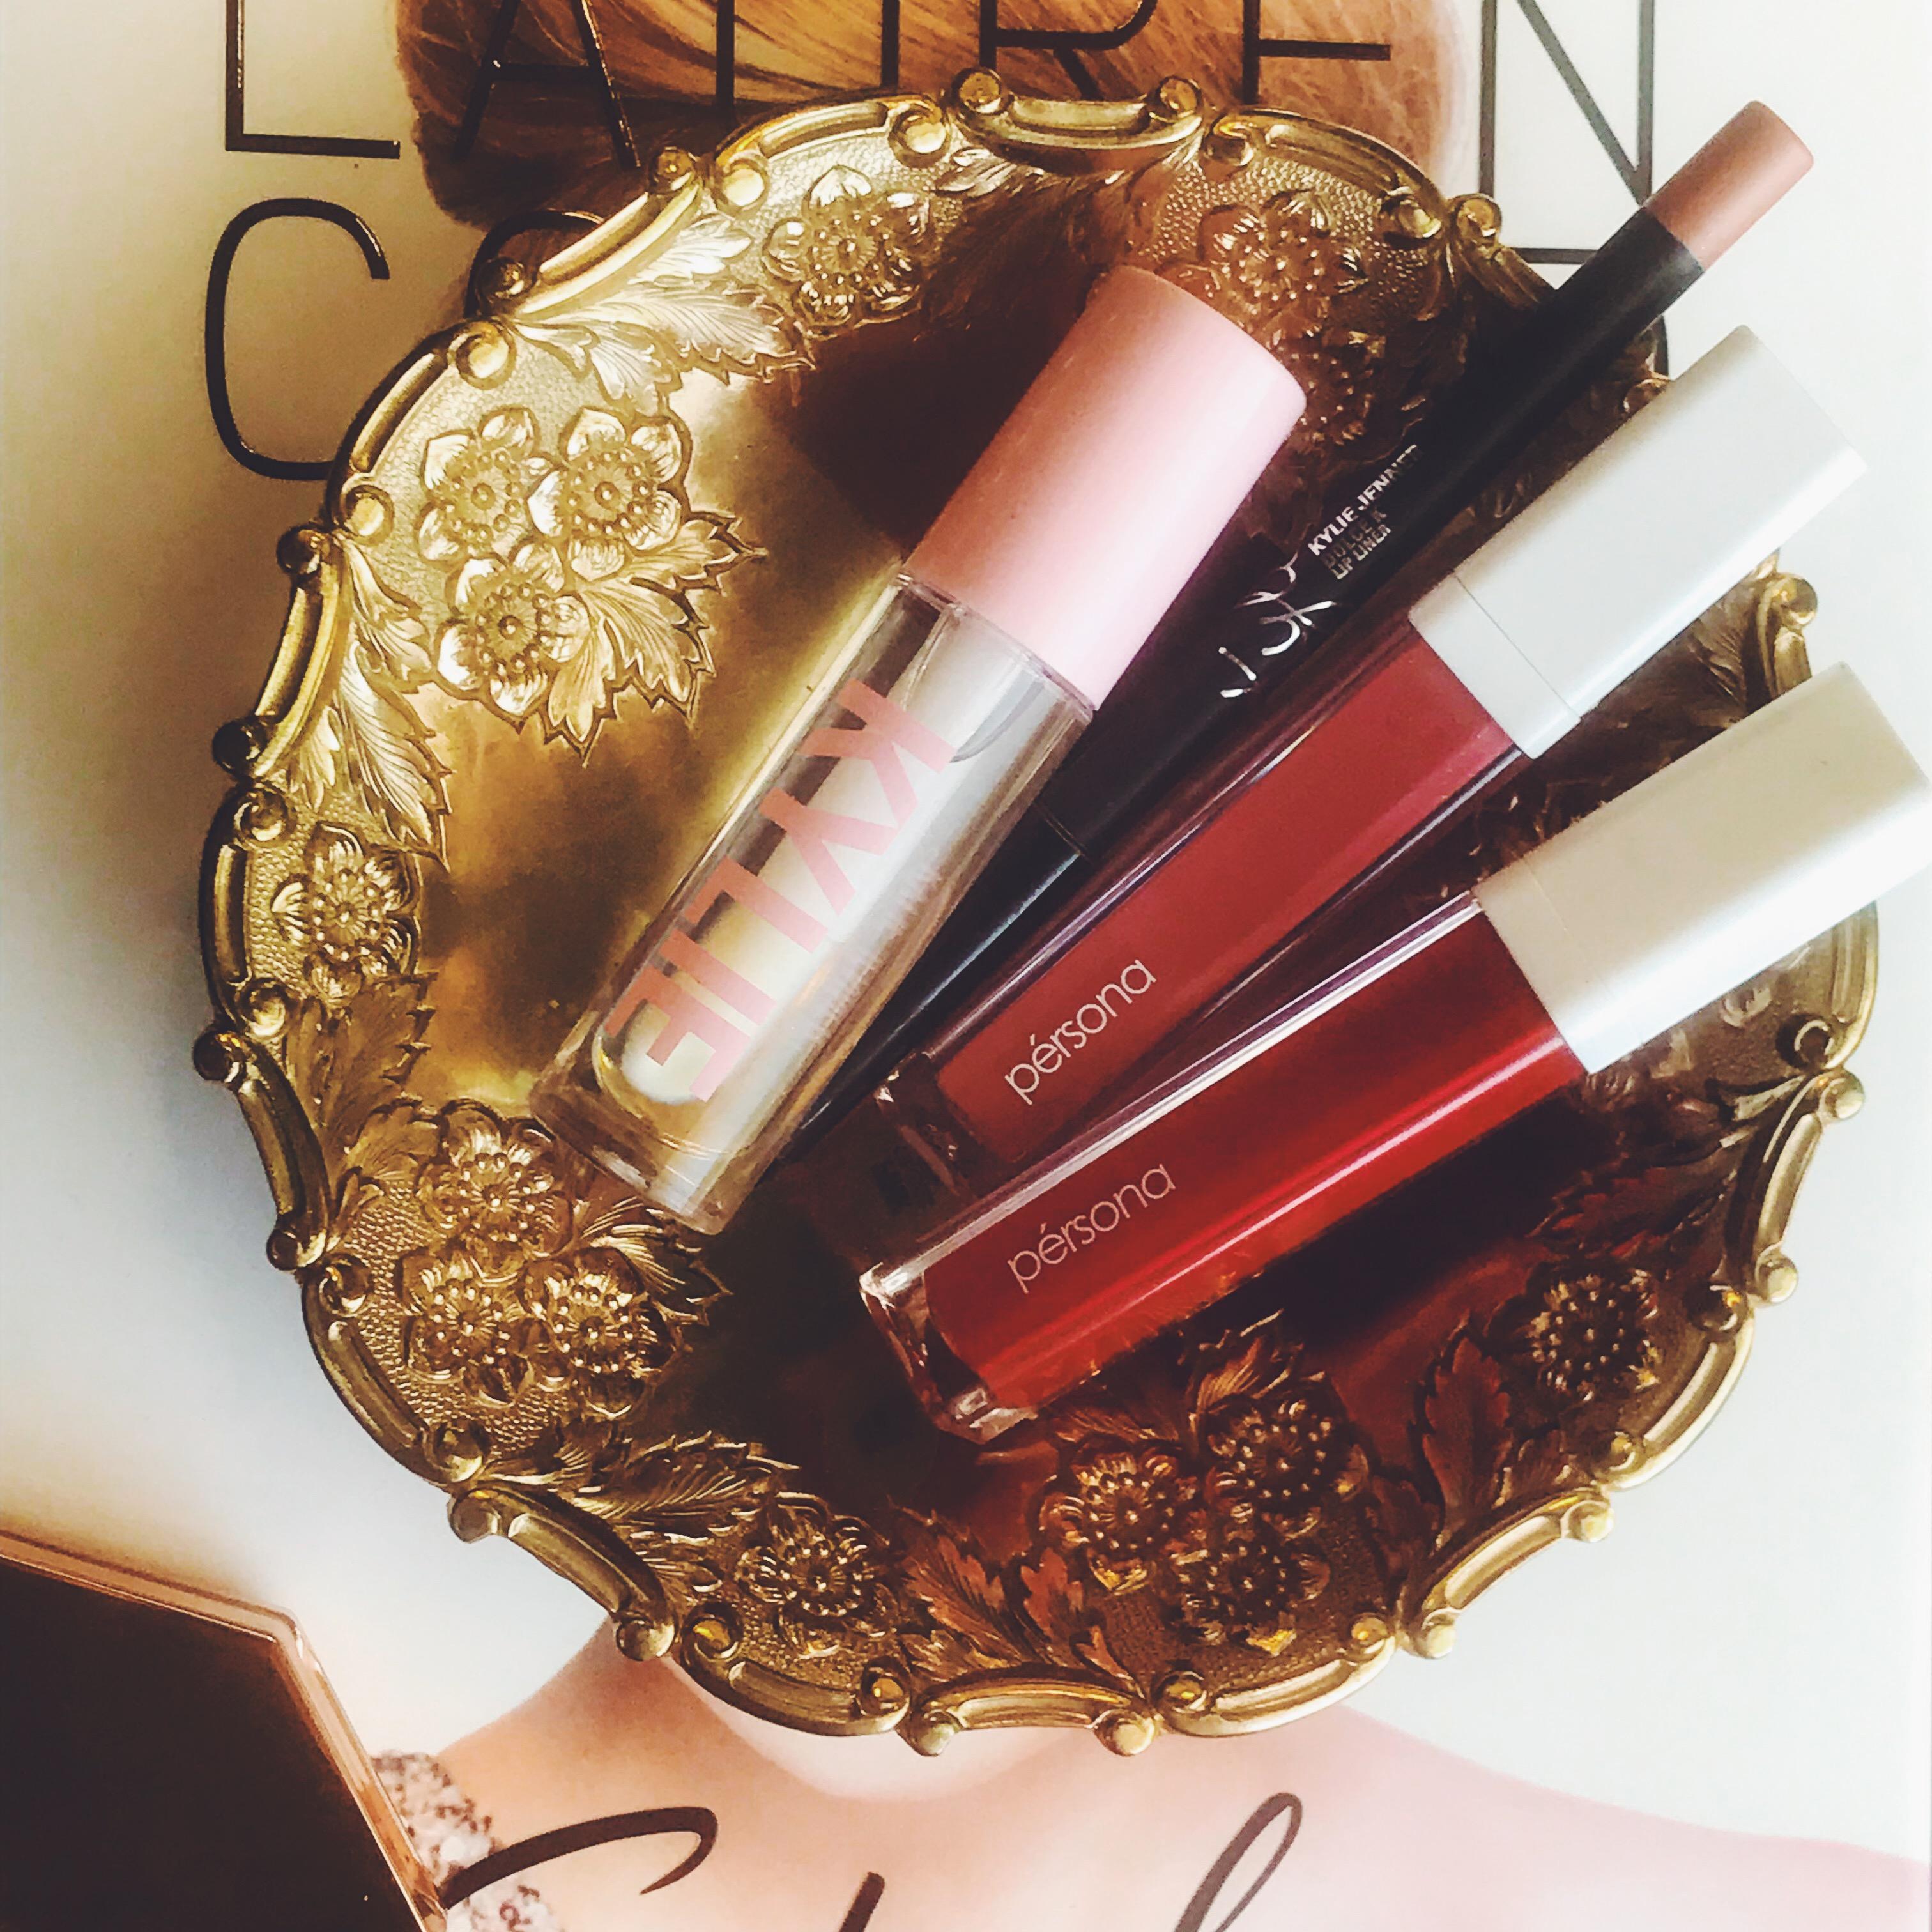 Not Your Basic Beauty Blogger Tag | Lip Gloss Flat Lay